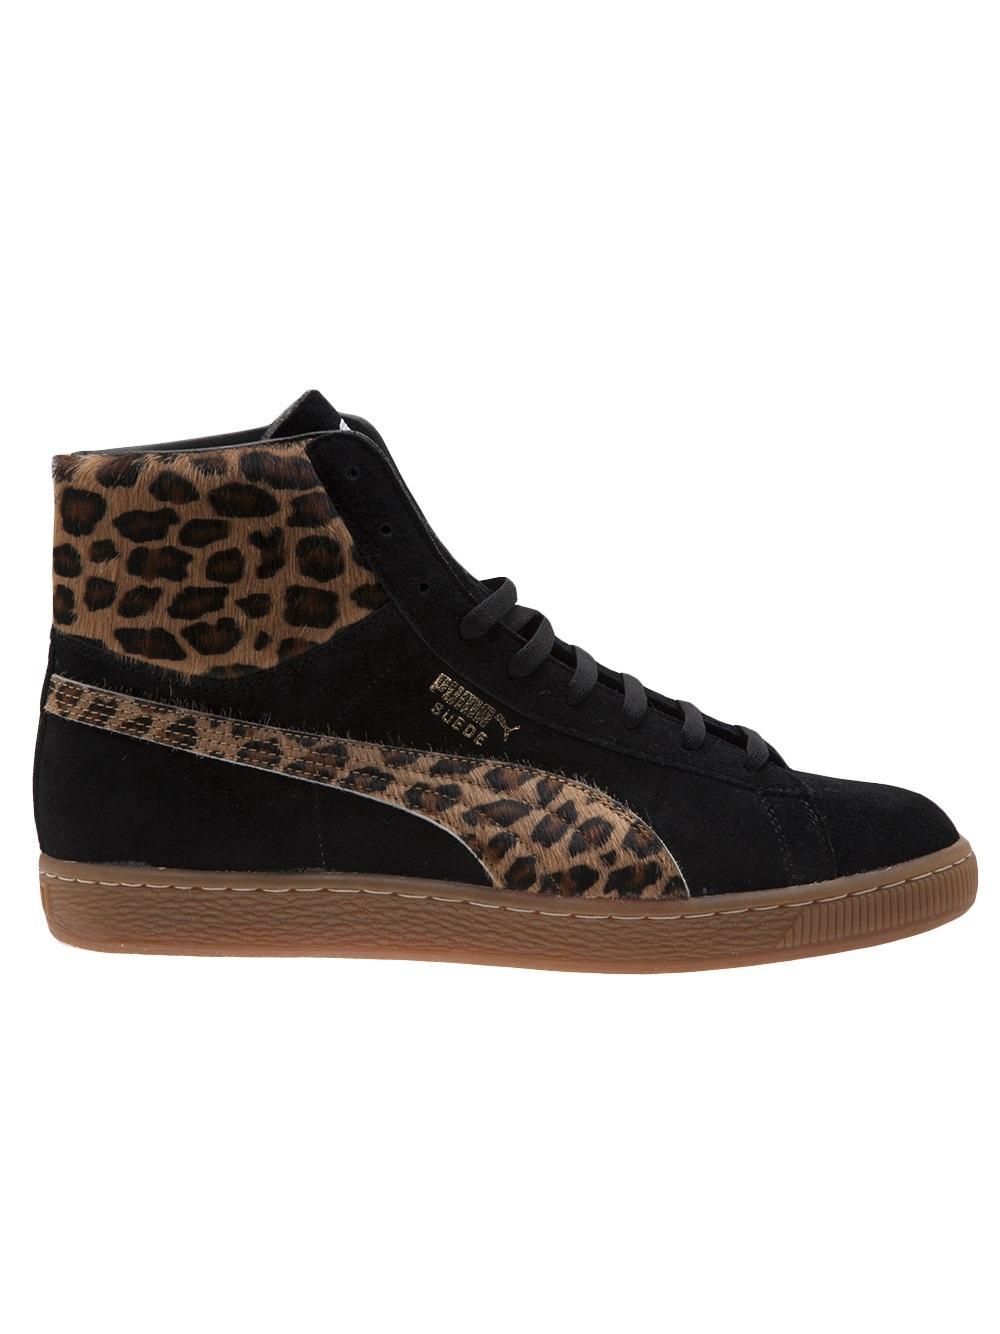 puma leopard high top trainer in black for men lyst